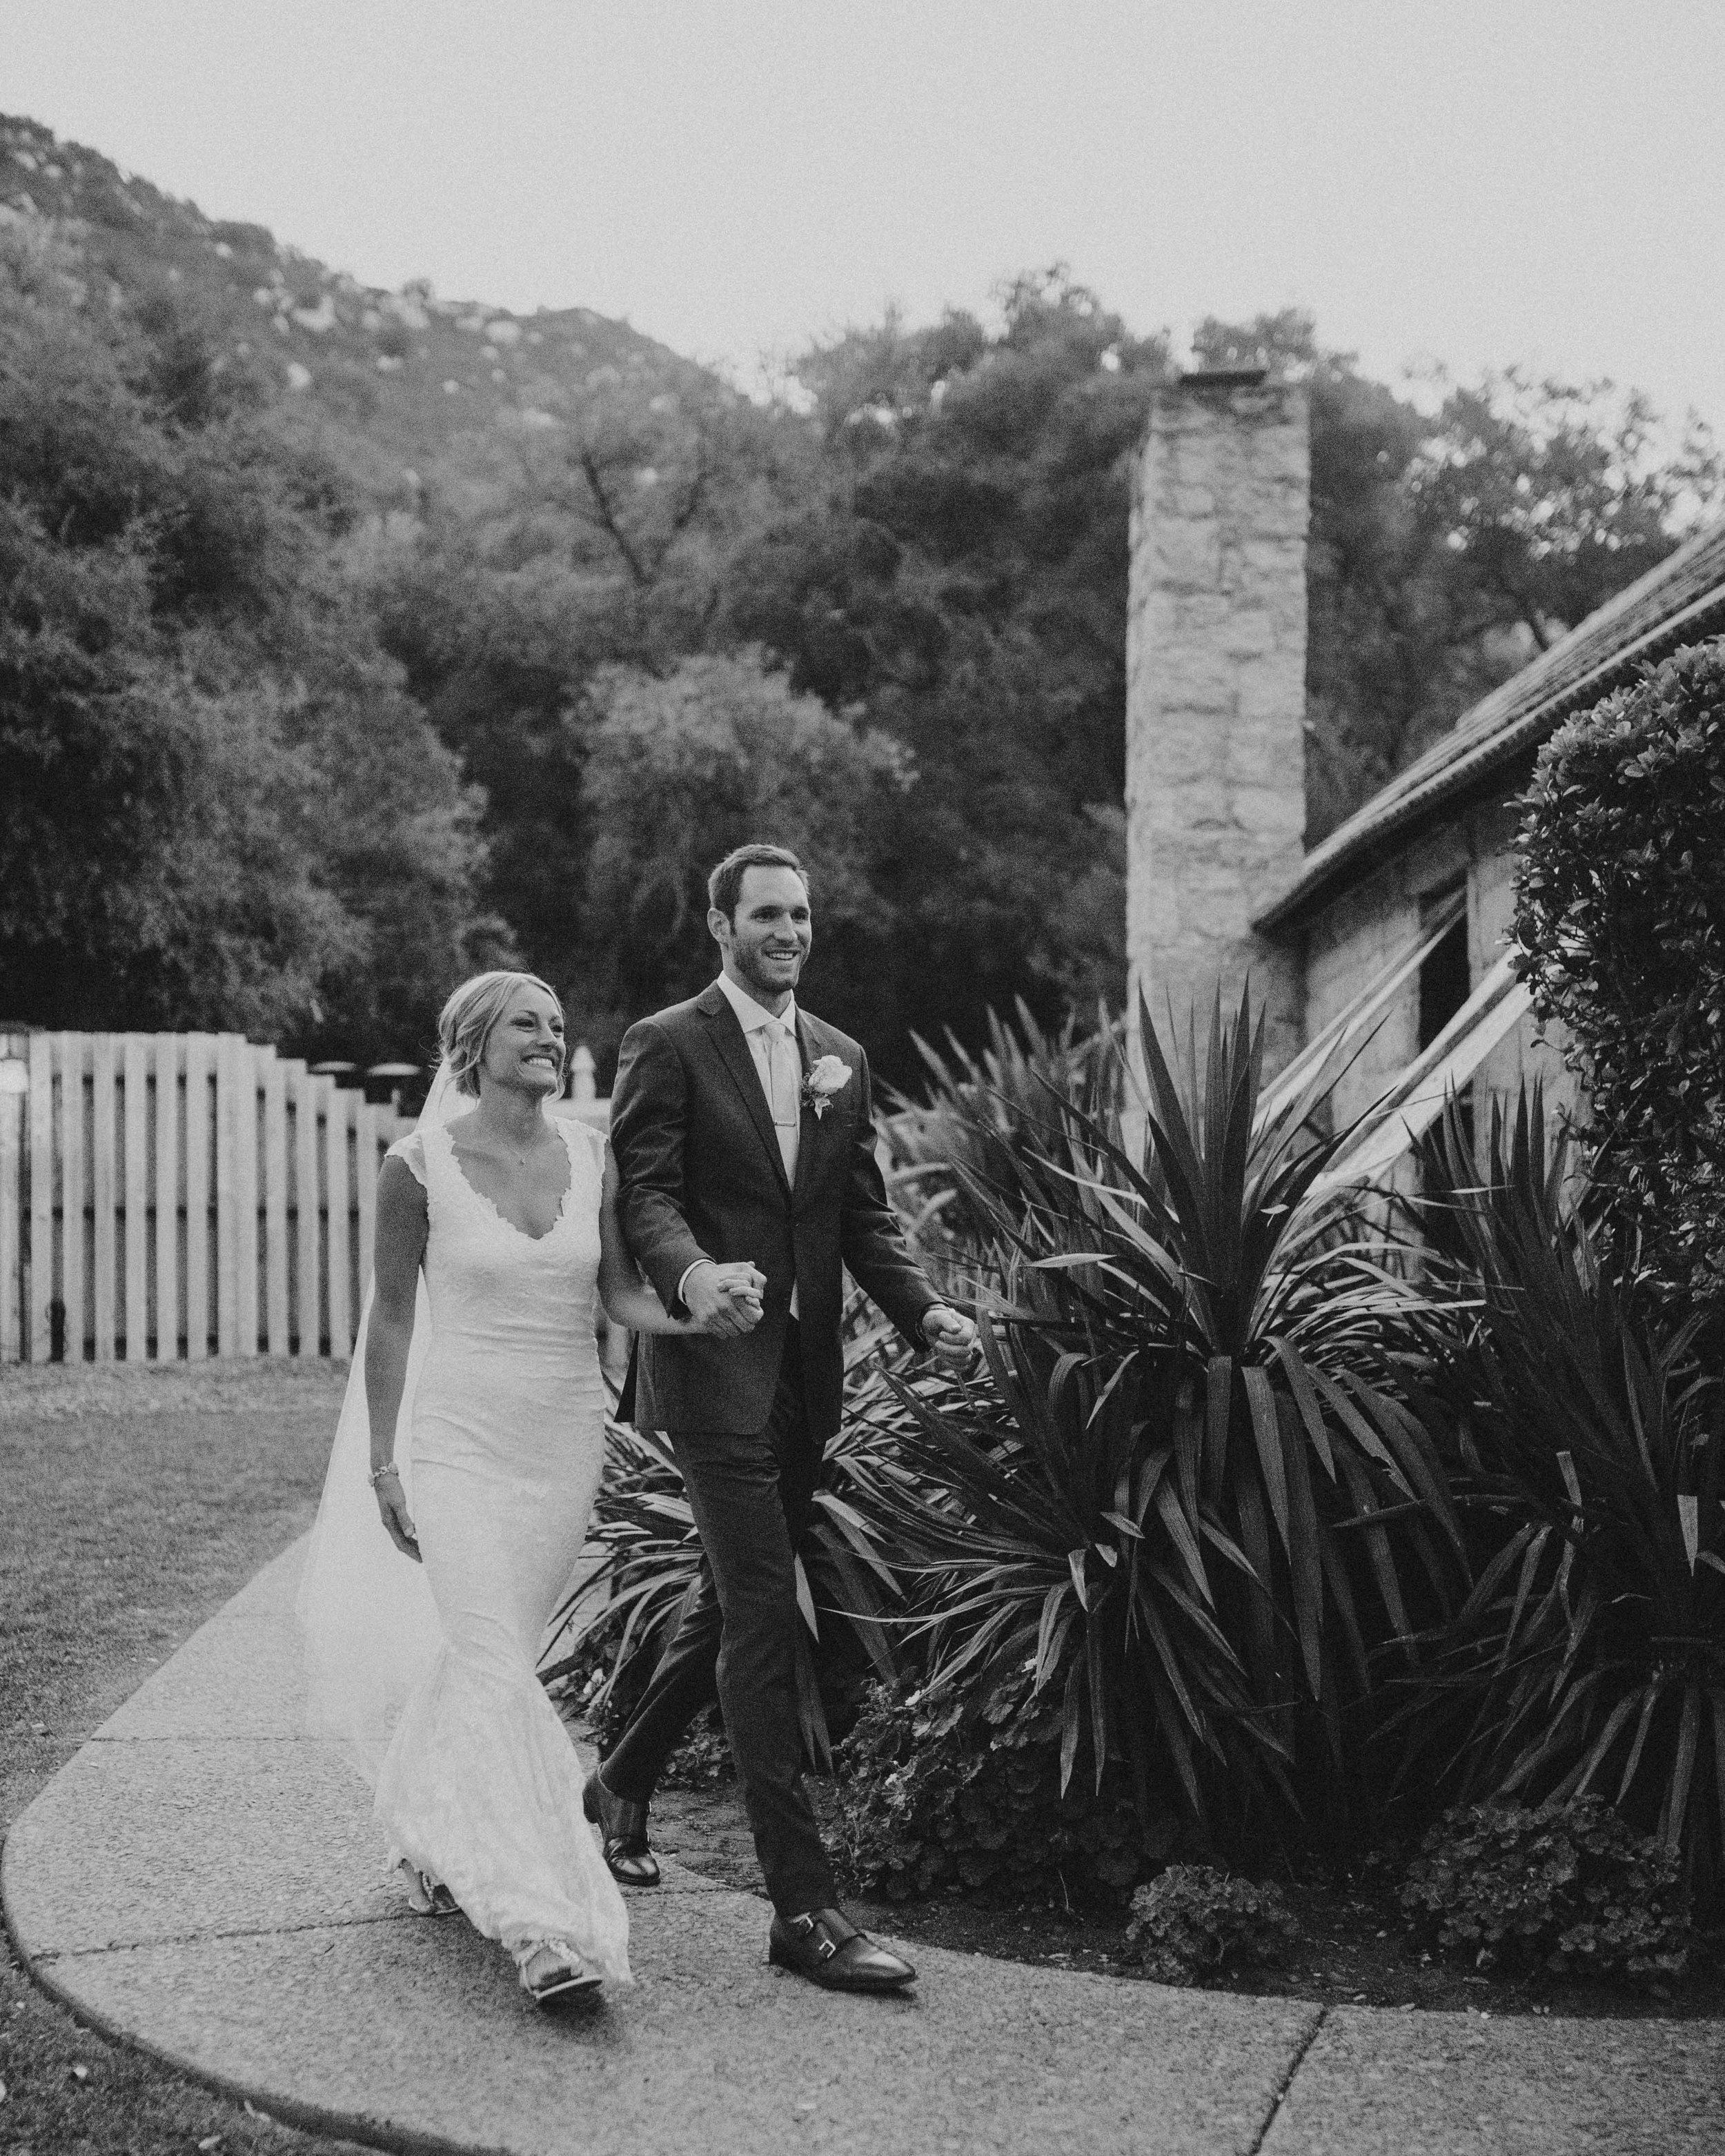 Salt-Lake-City-Wedding-Photographer-55.jpg